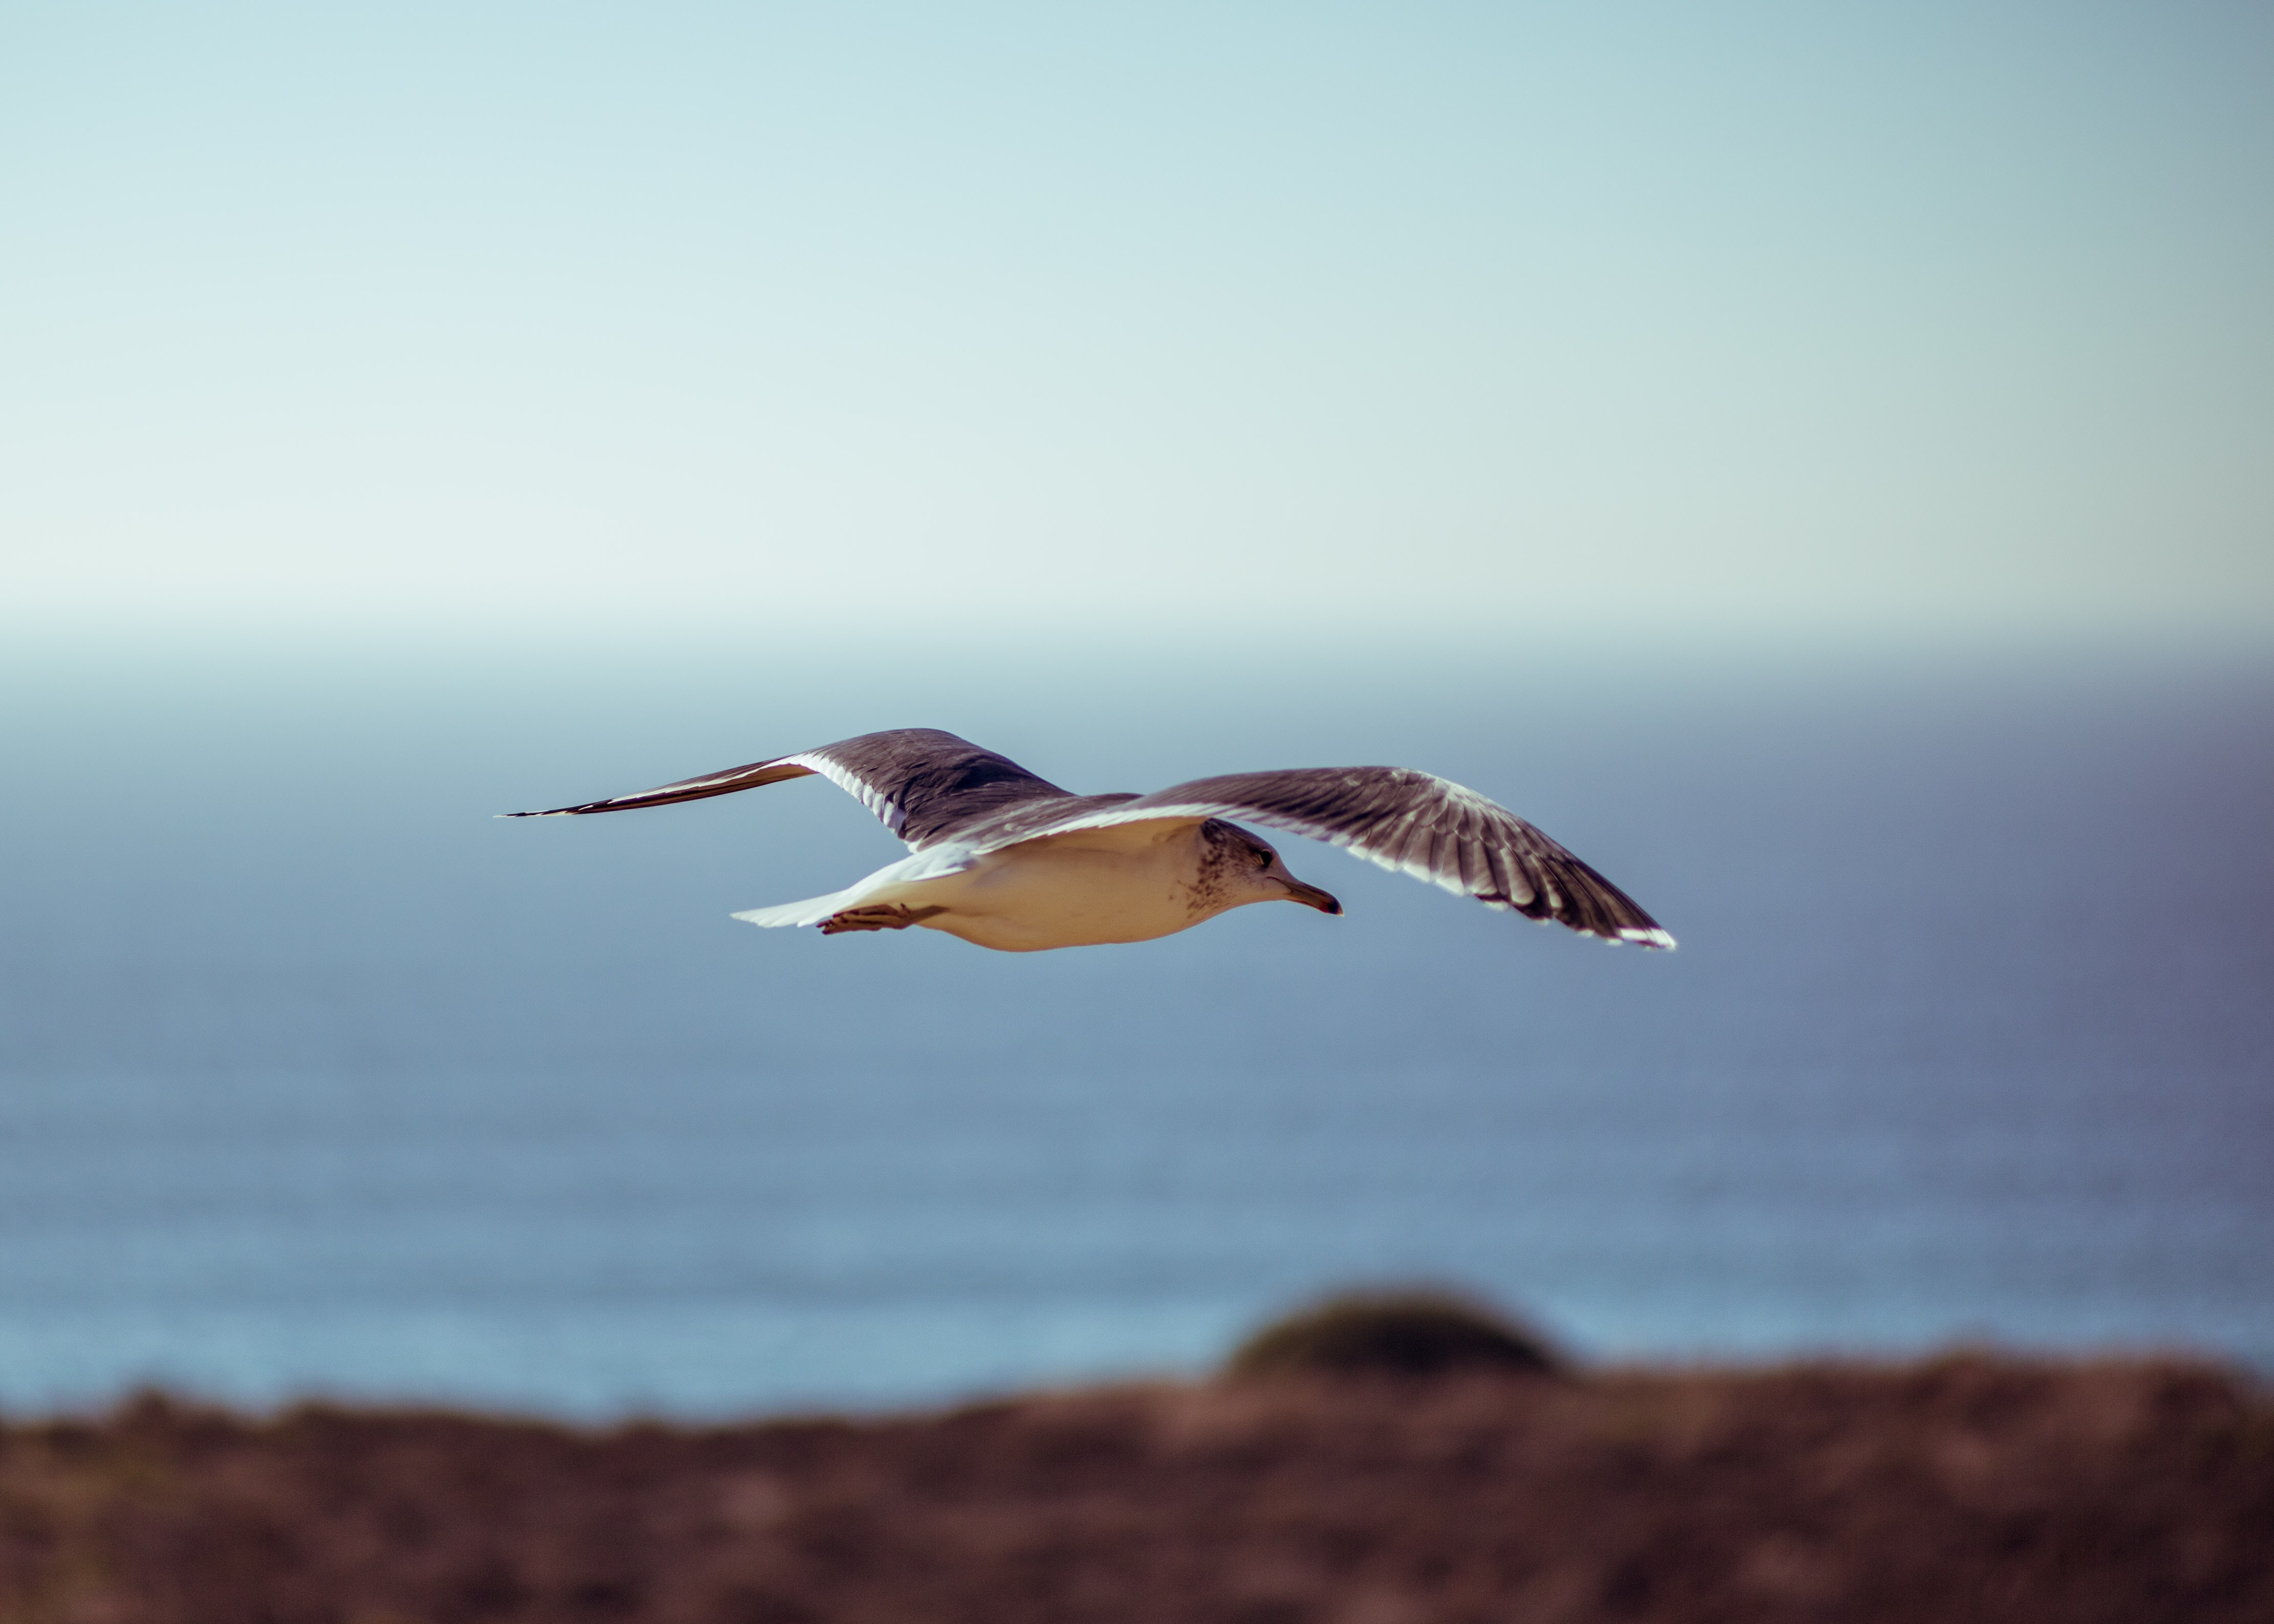 macro photography of brown bird